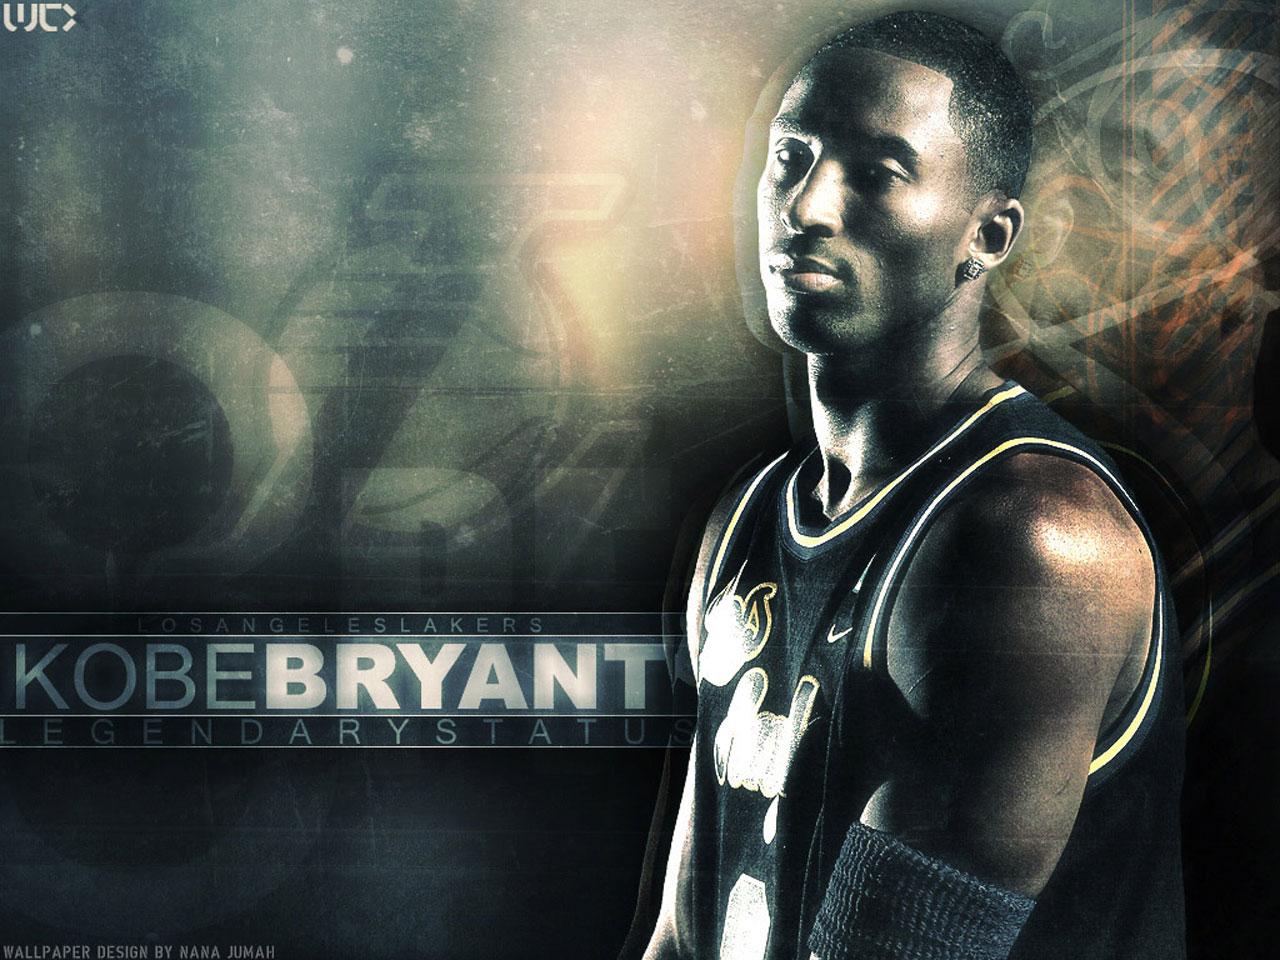 Kobe Bryant Wallpaper Basketball Wallpapers at BasketWallpaperscom 1280x960